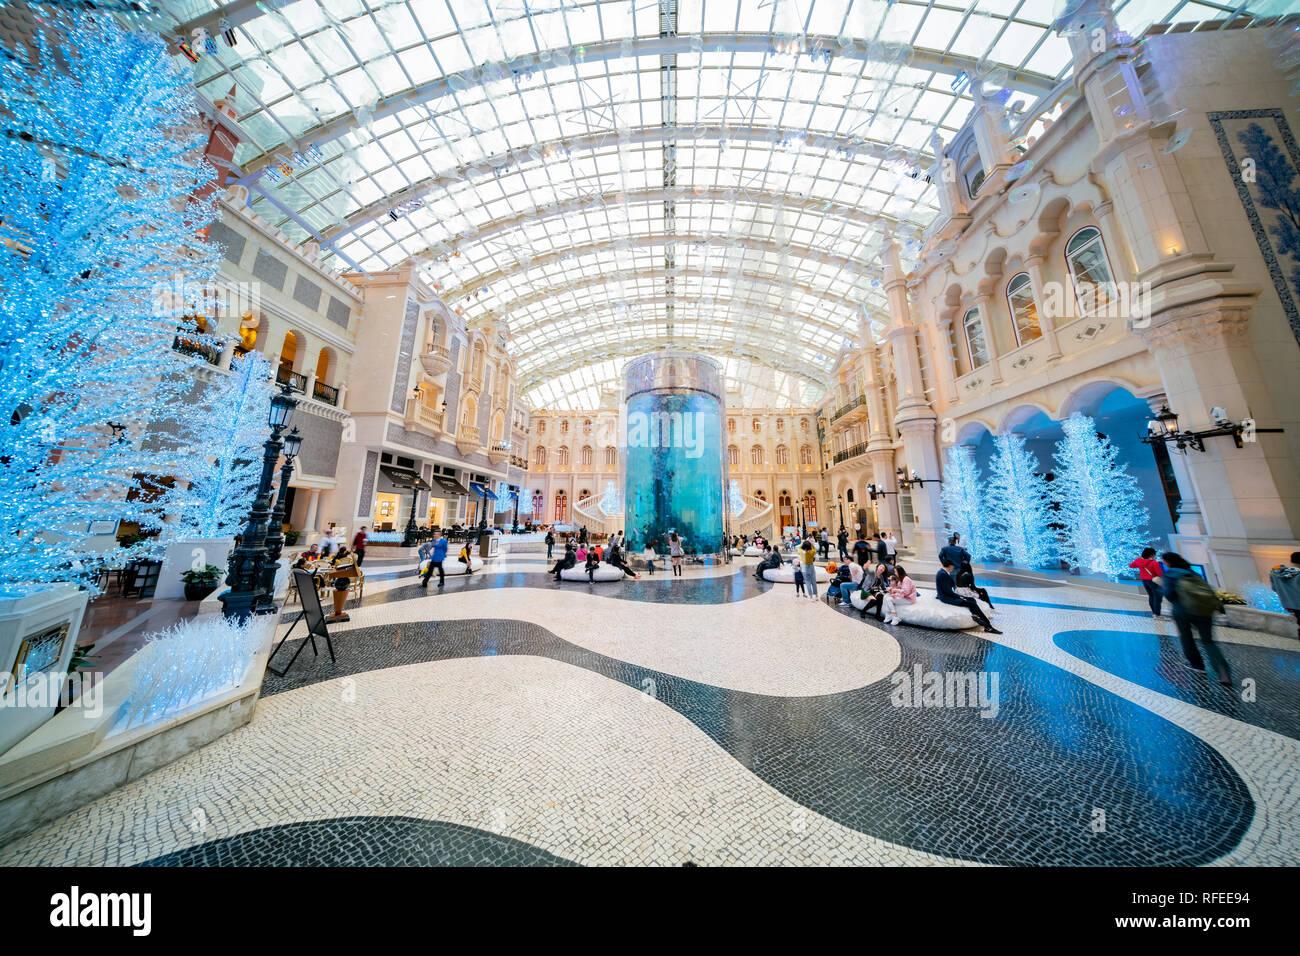 Macau, DEC 24: Interior view of the famous Casino Hotel MGM on DEC 24, 2018 at Macau - Stock Image